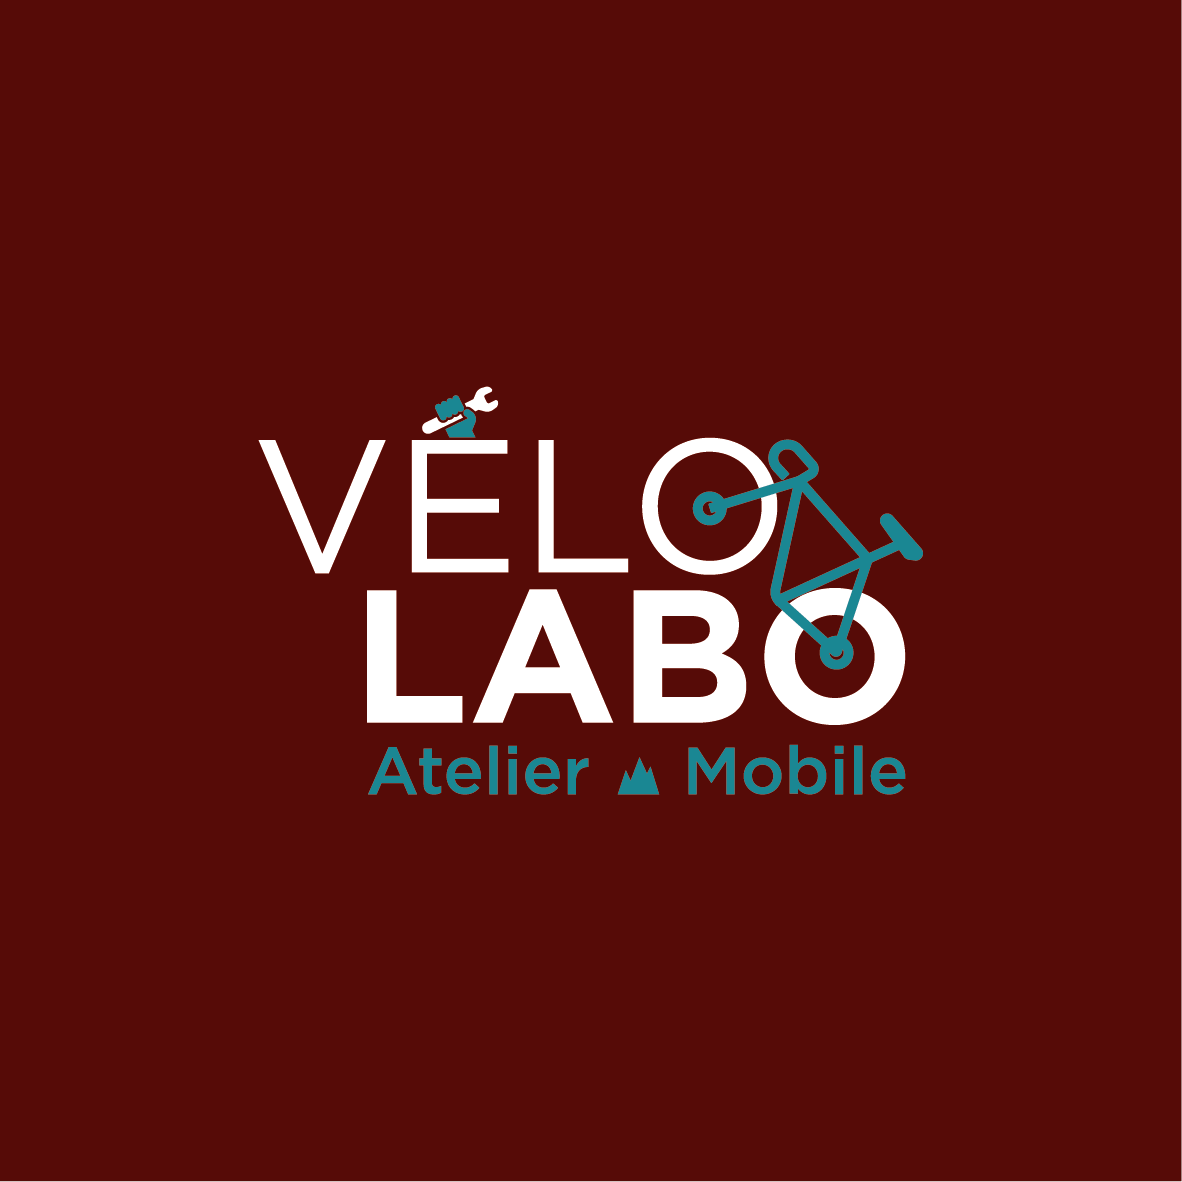 Creation de logo Vélo Labo - atelier mobile - Savoie